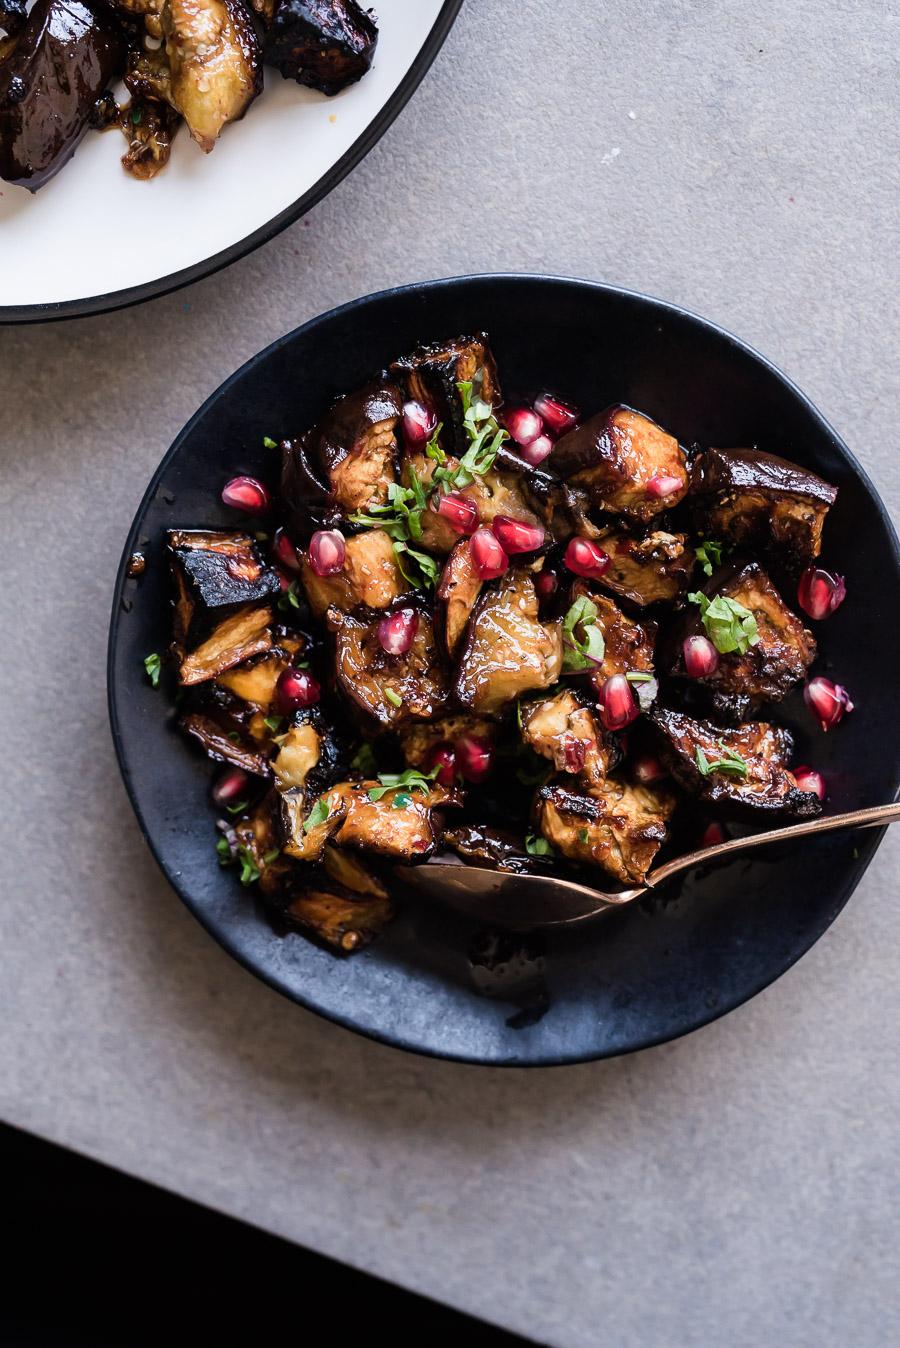 Pomegranate Molasses Harissa Roasted Eggplant